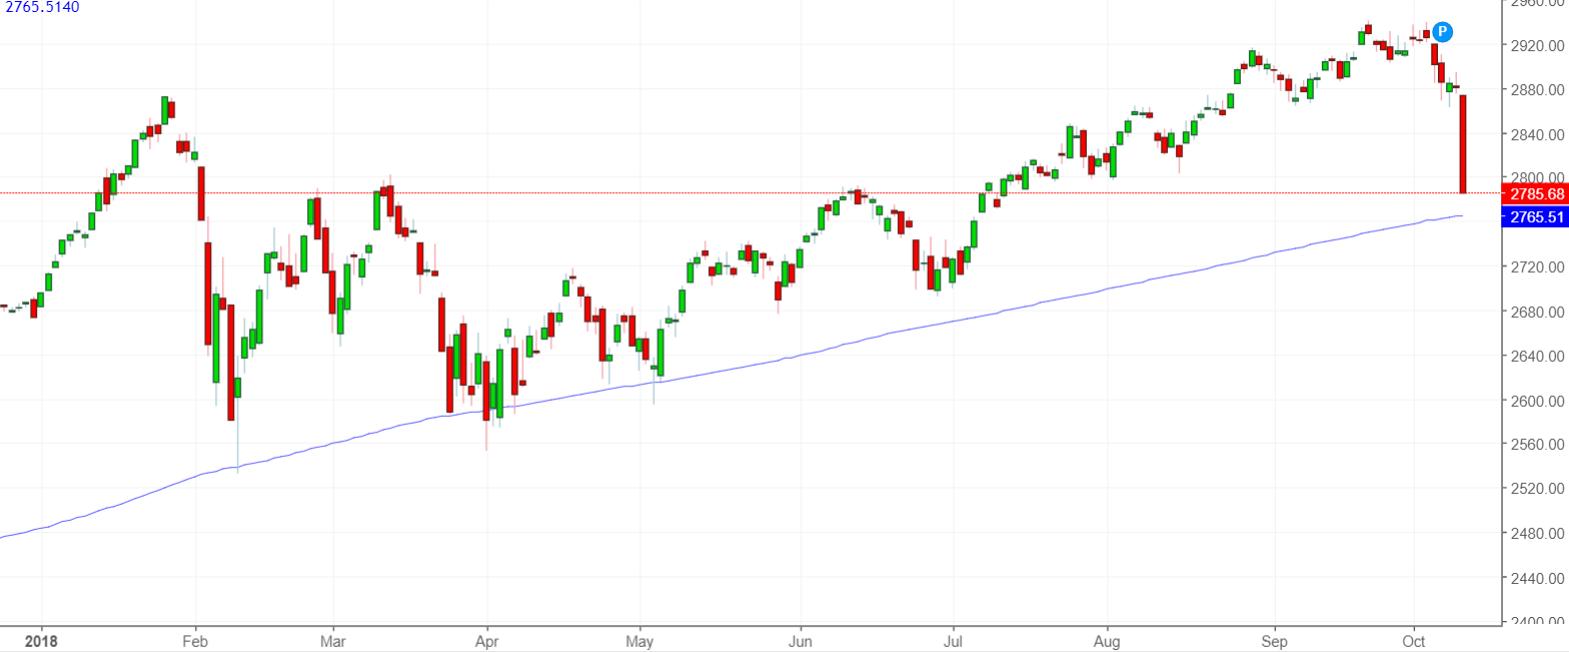 Stock Market Crashed, What's Next? Hint, Don't Panic